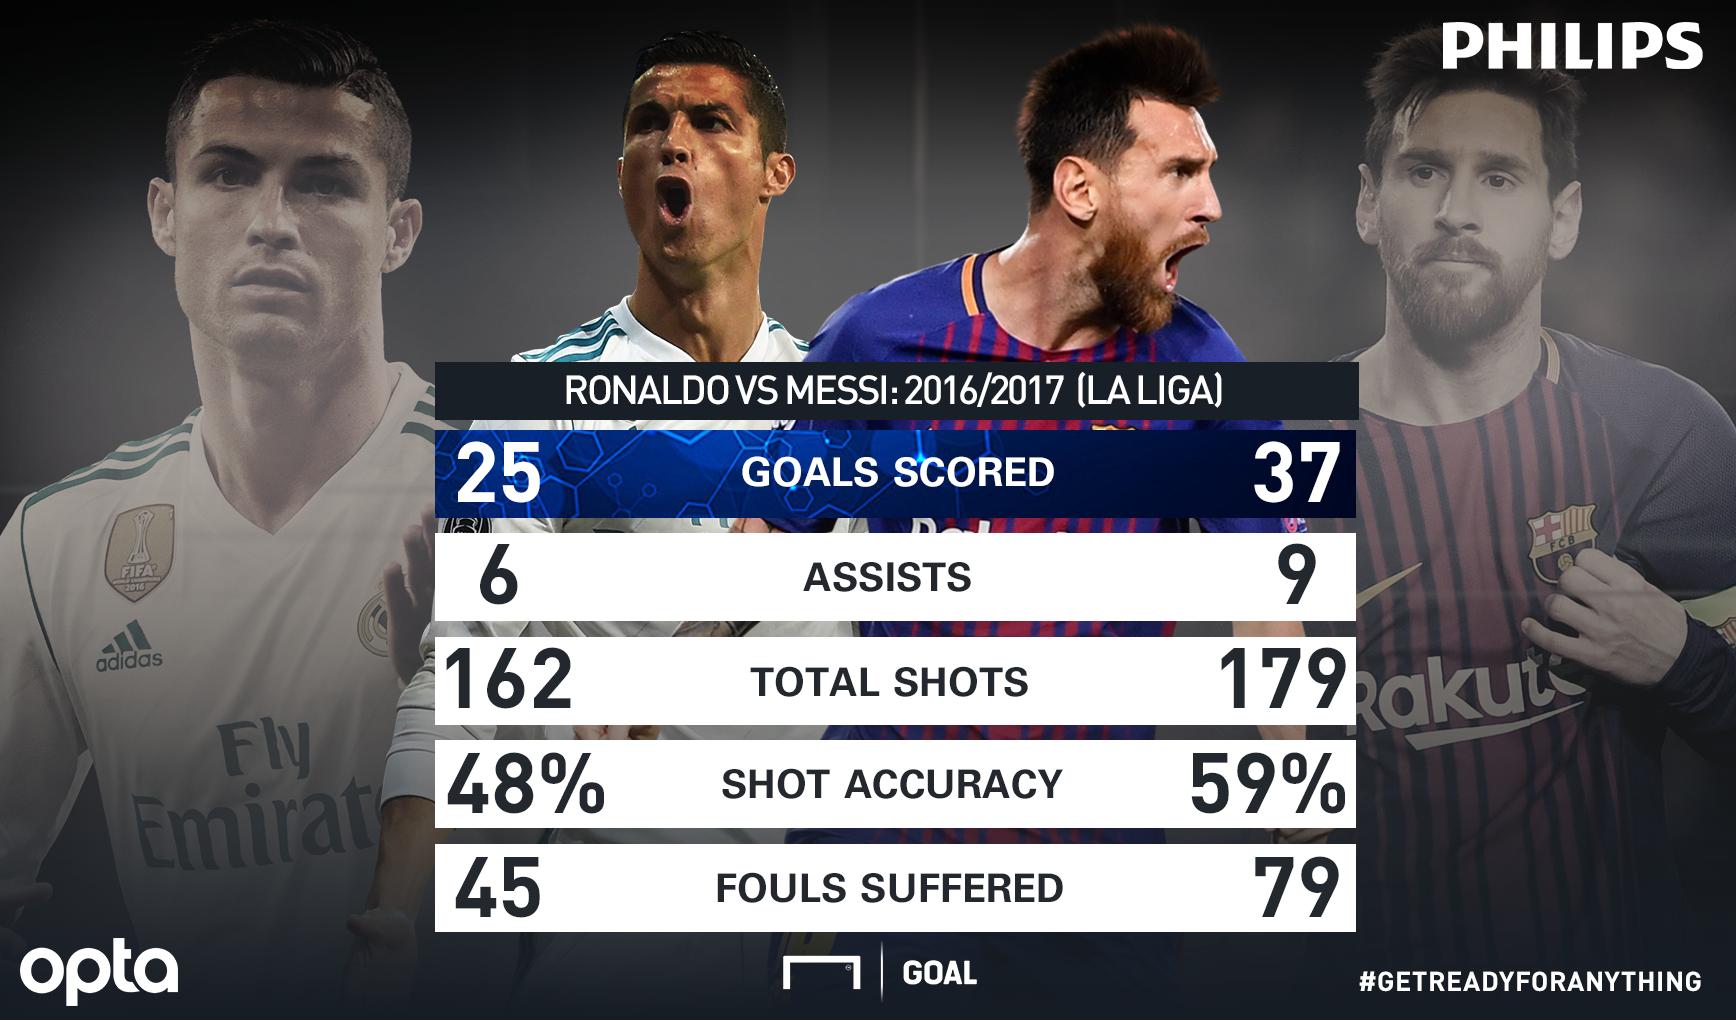 Ronaldo Messi en